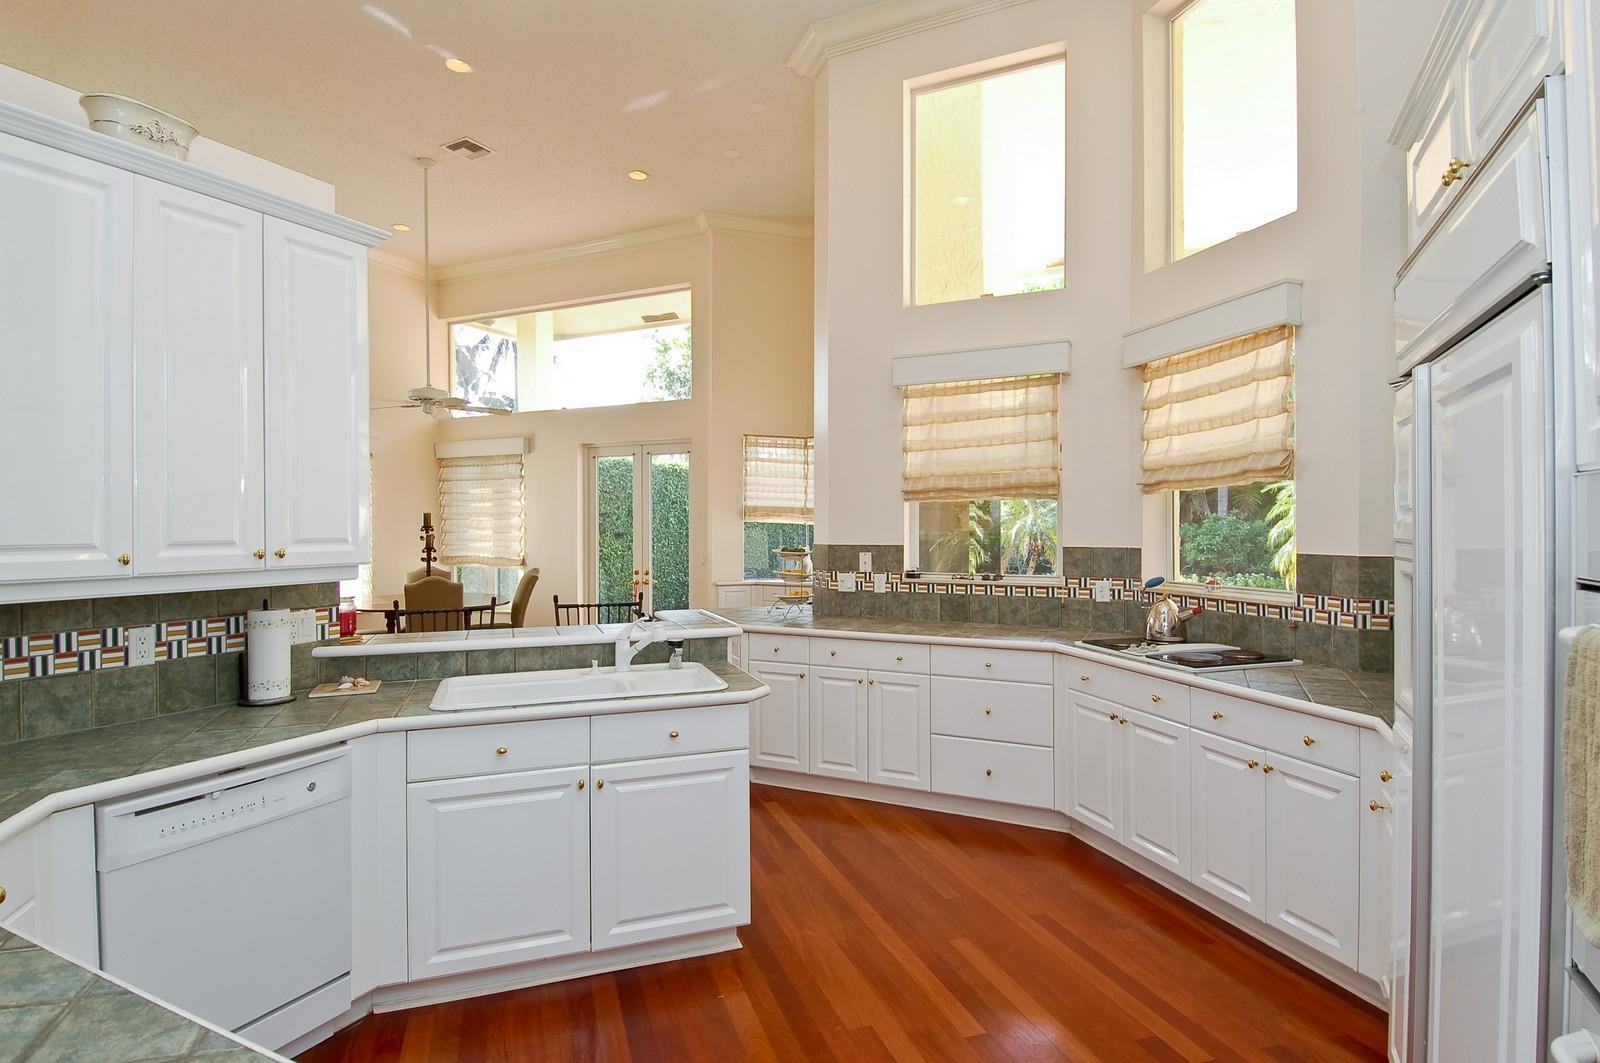 Real Estate Photography - 6329 NW 23rd Way, Boca Raton, FL, 33496 - Kitchen